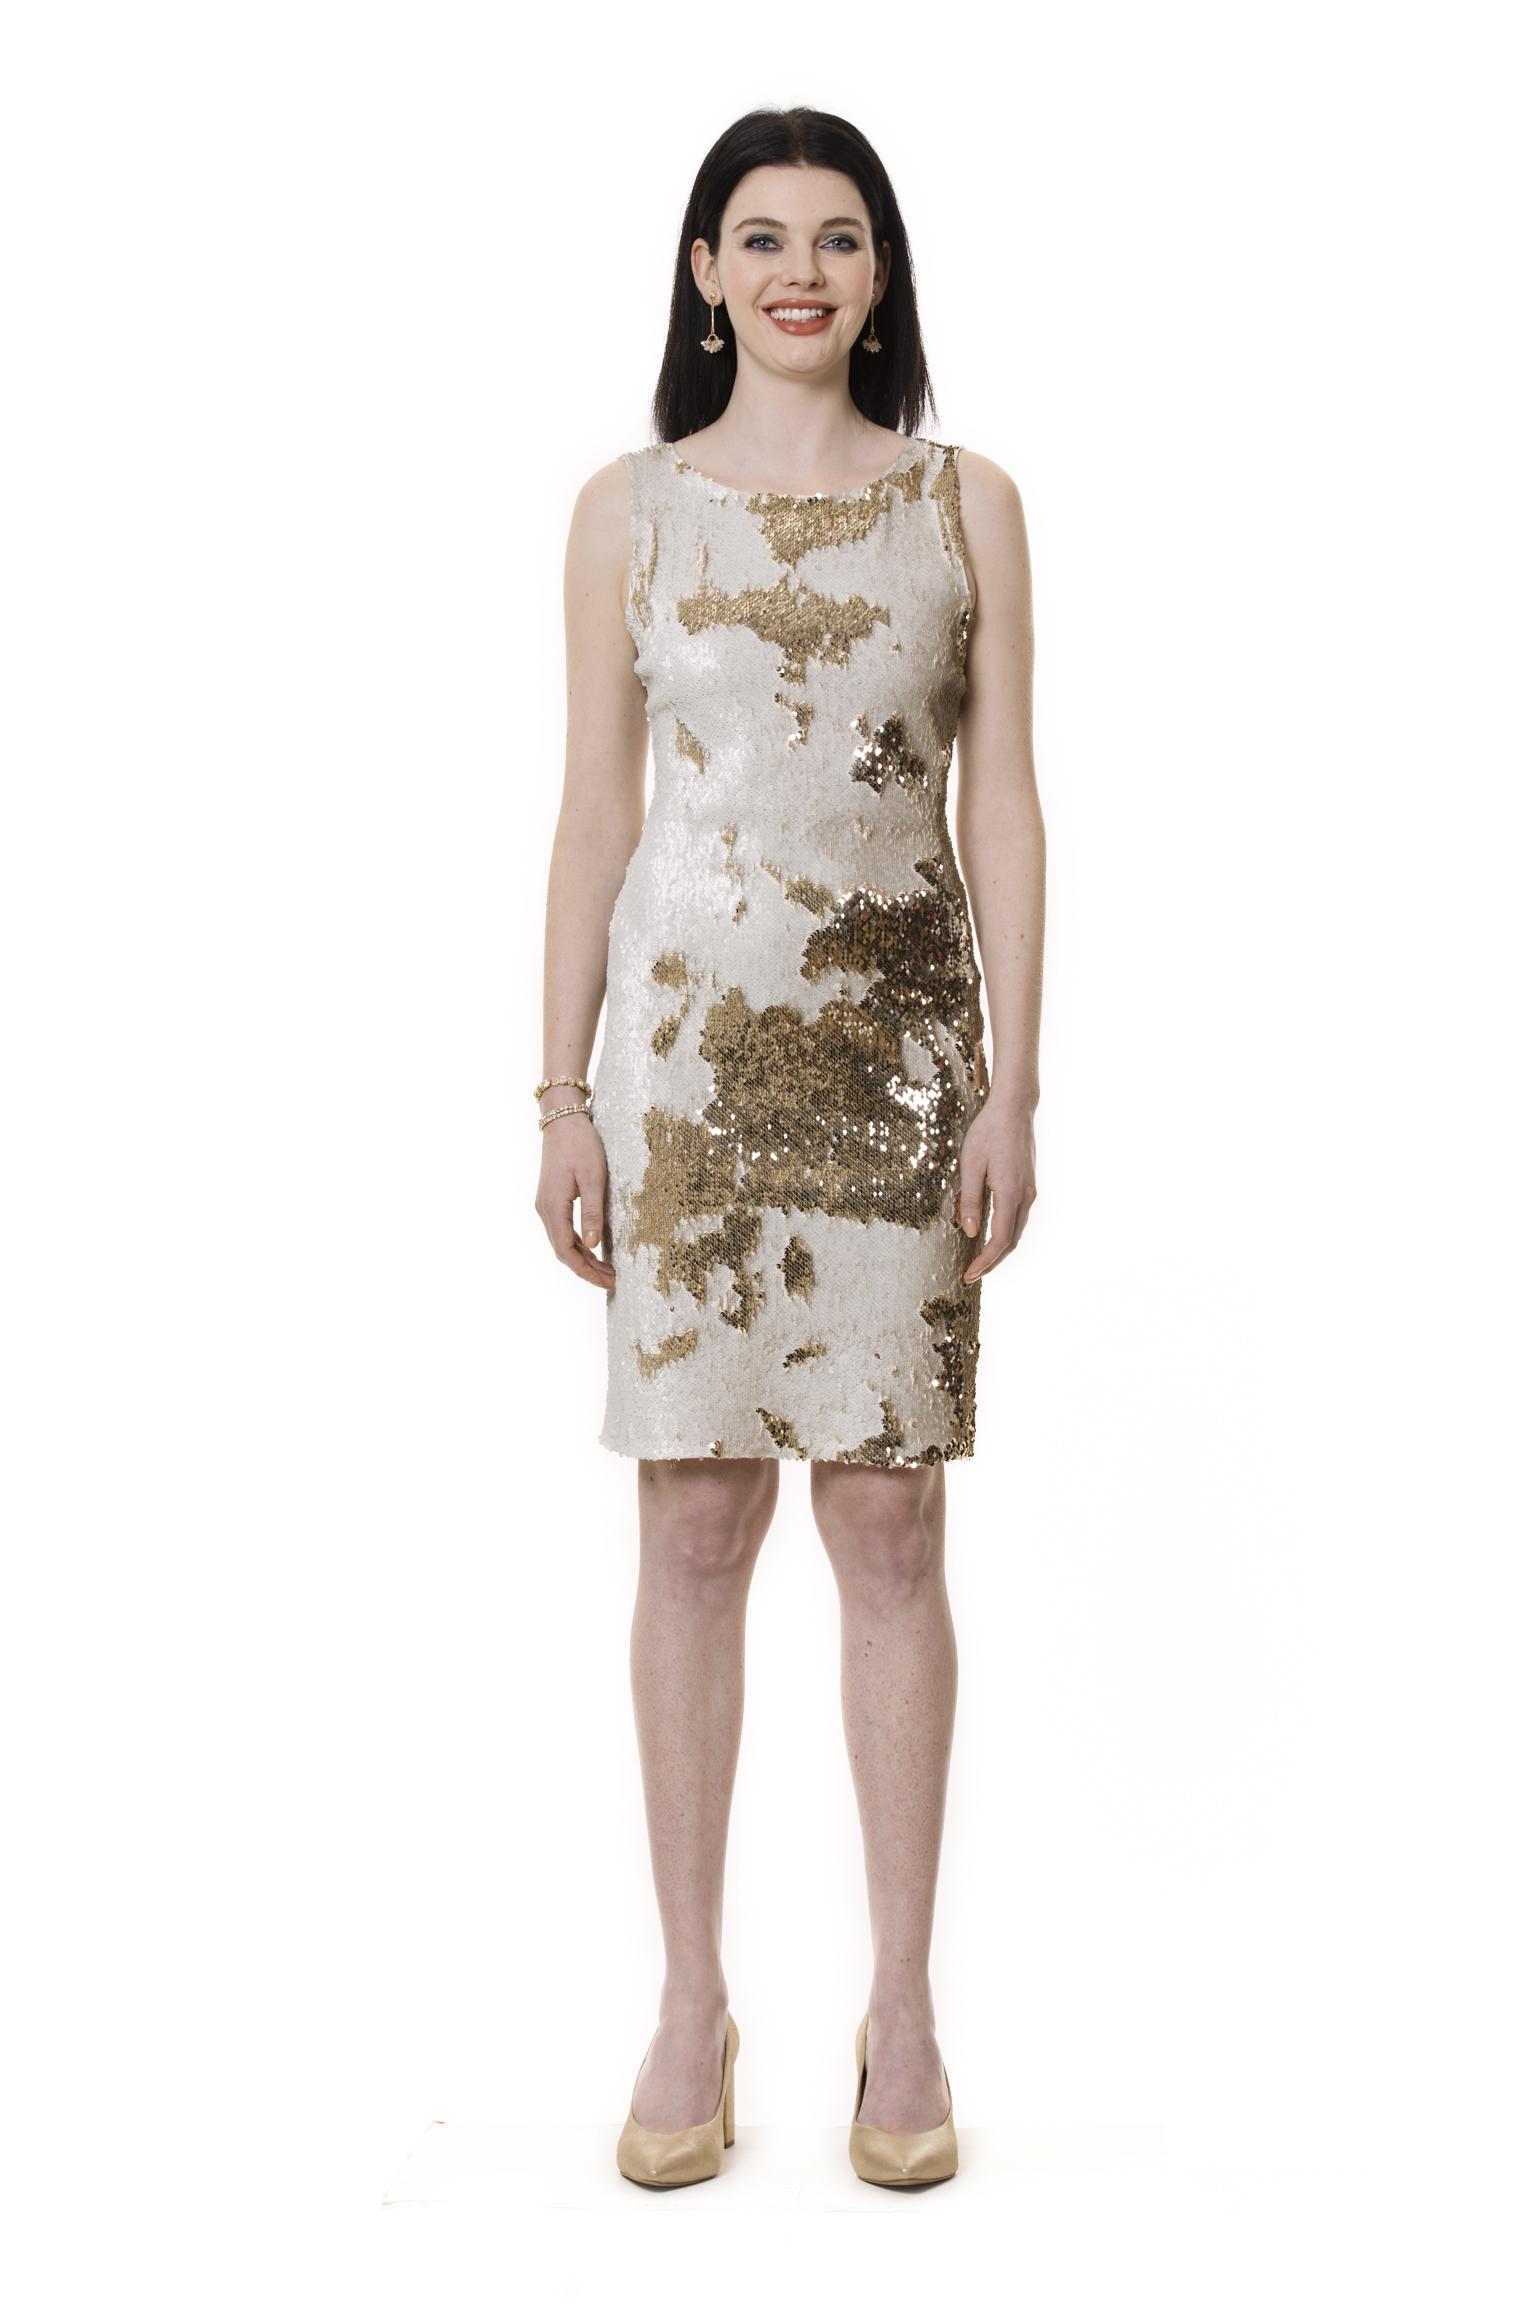 Garment Viewer Image